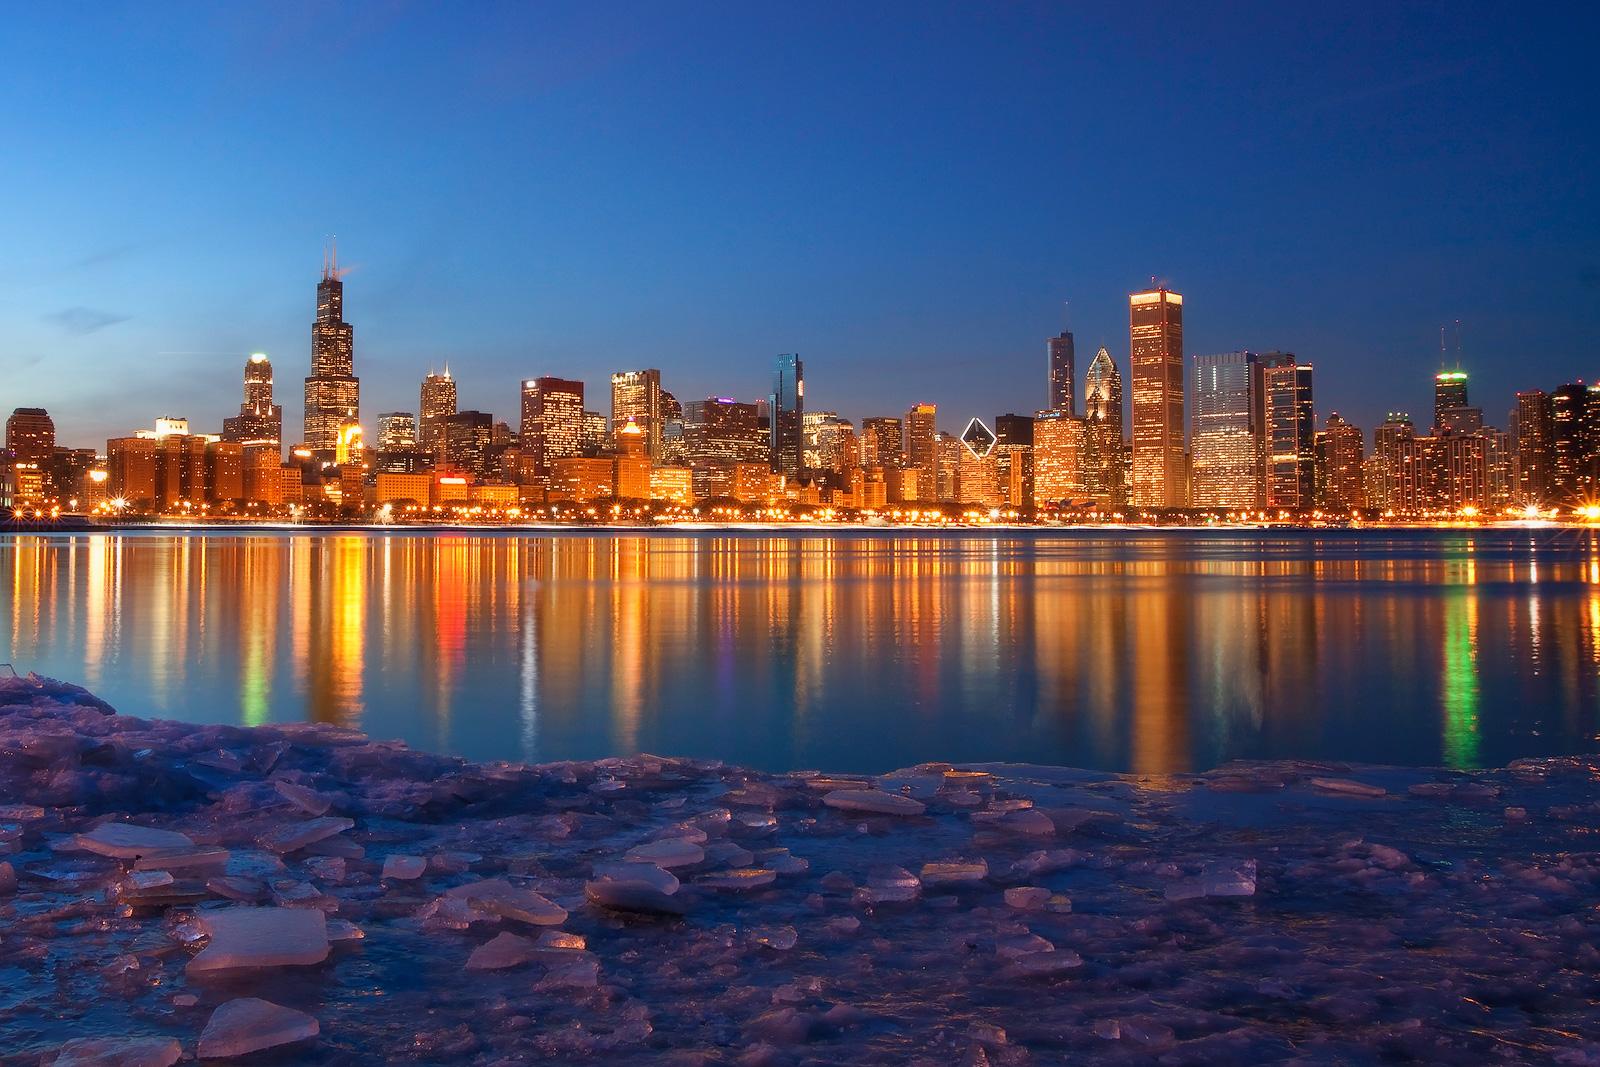 america,building,chicago,city scape,cityscape,horizontal,ice,il,illinois,midwest,north america,planetarium,skyline,united states,us,usa,winter, photo